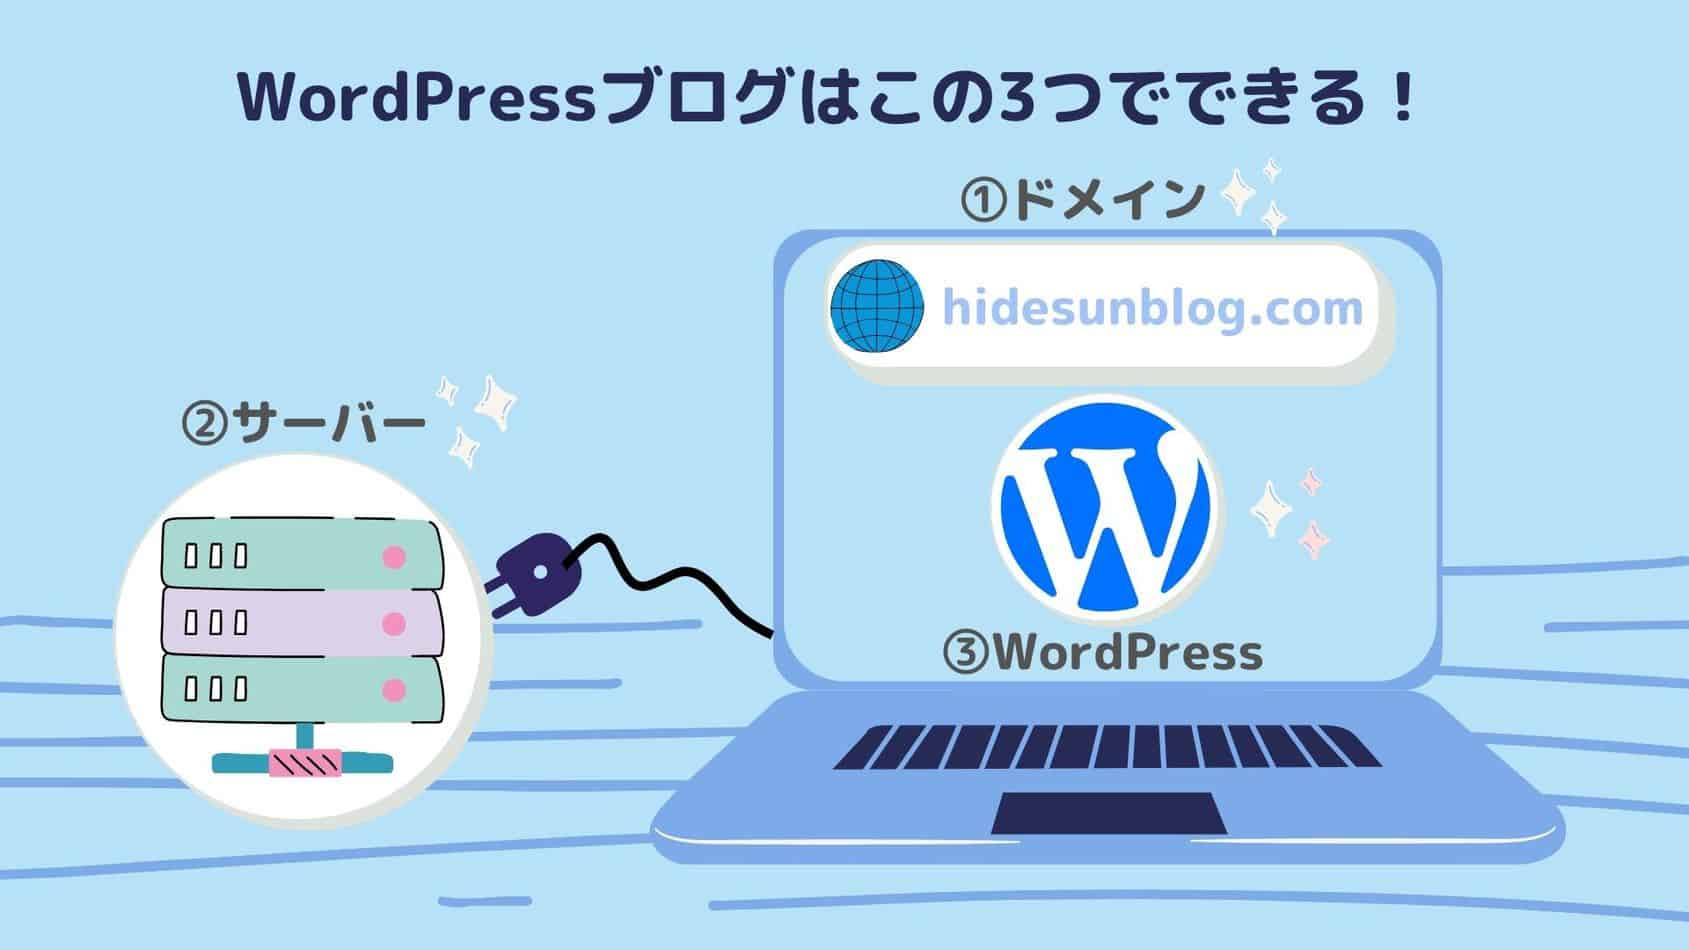 WordPressでブログを始めるまでの全体像